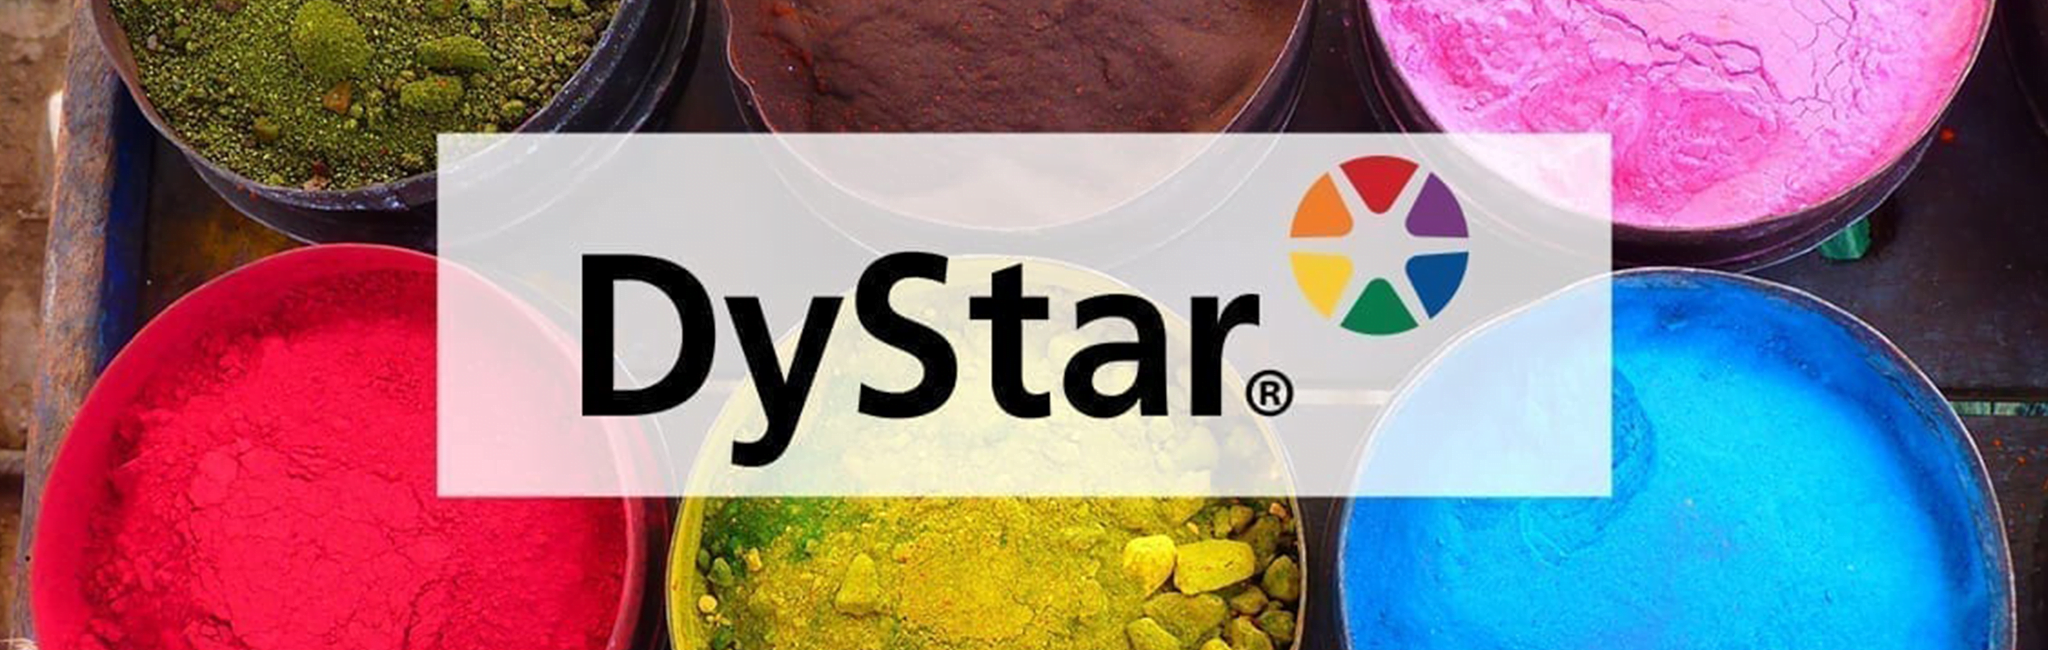 Dystar Banner